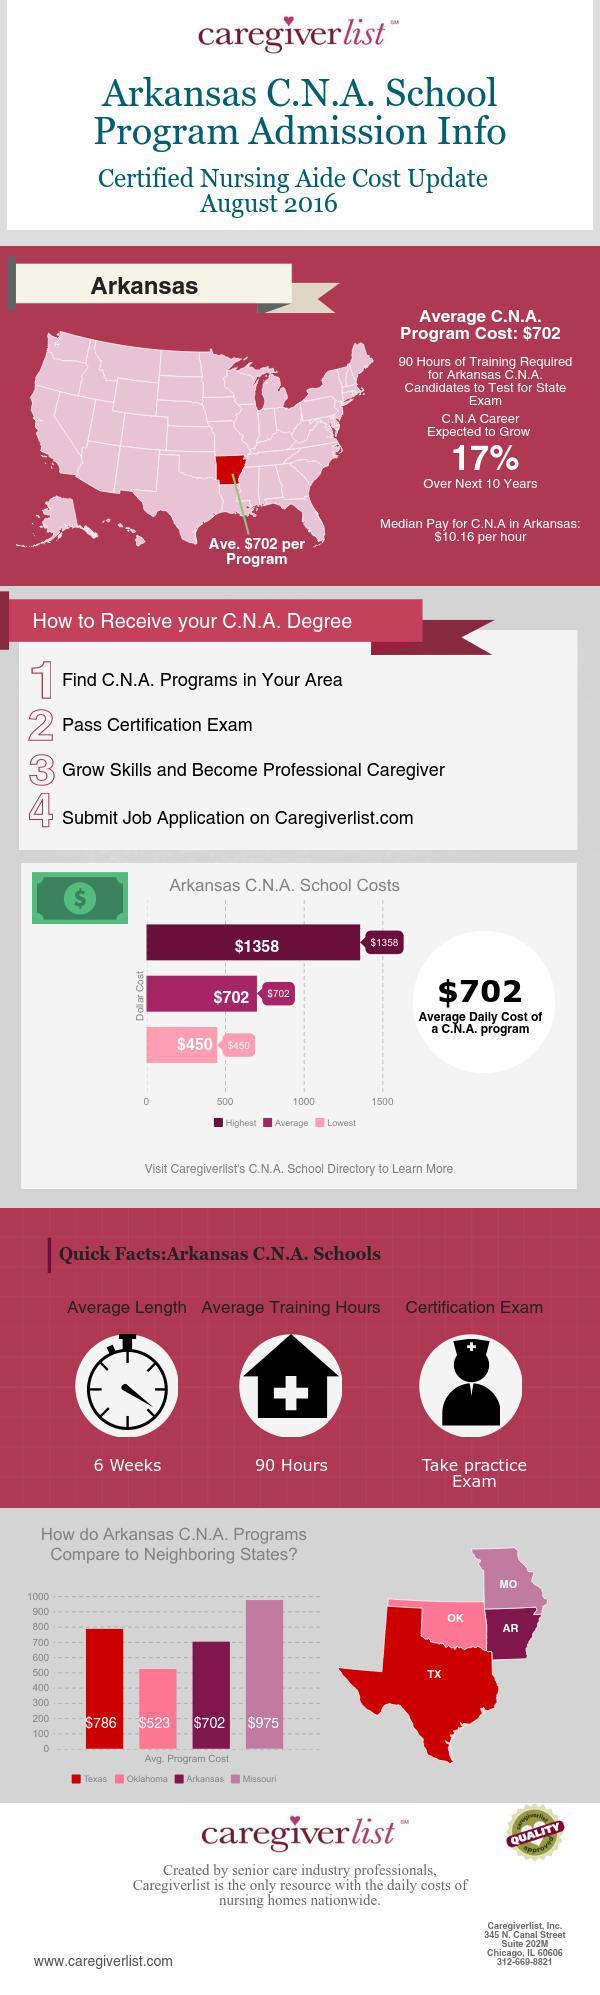 Find Arkansas C.N.A. School Costs